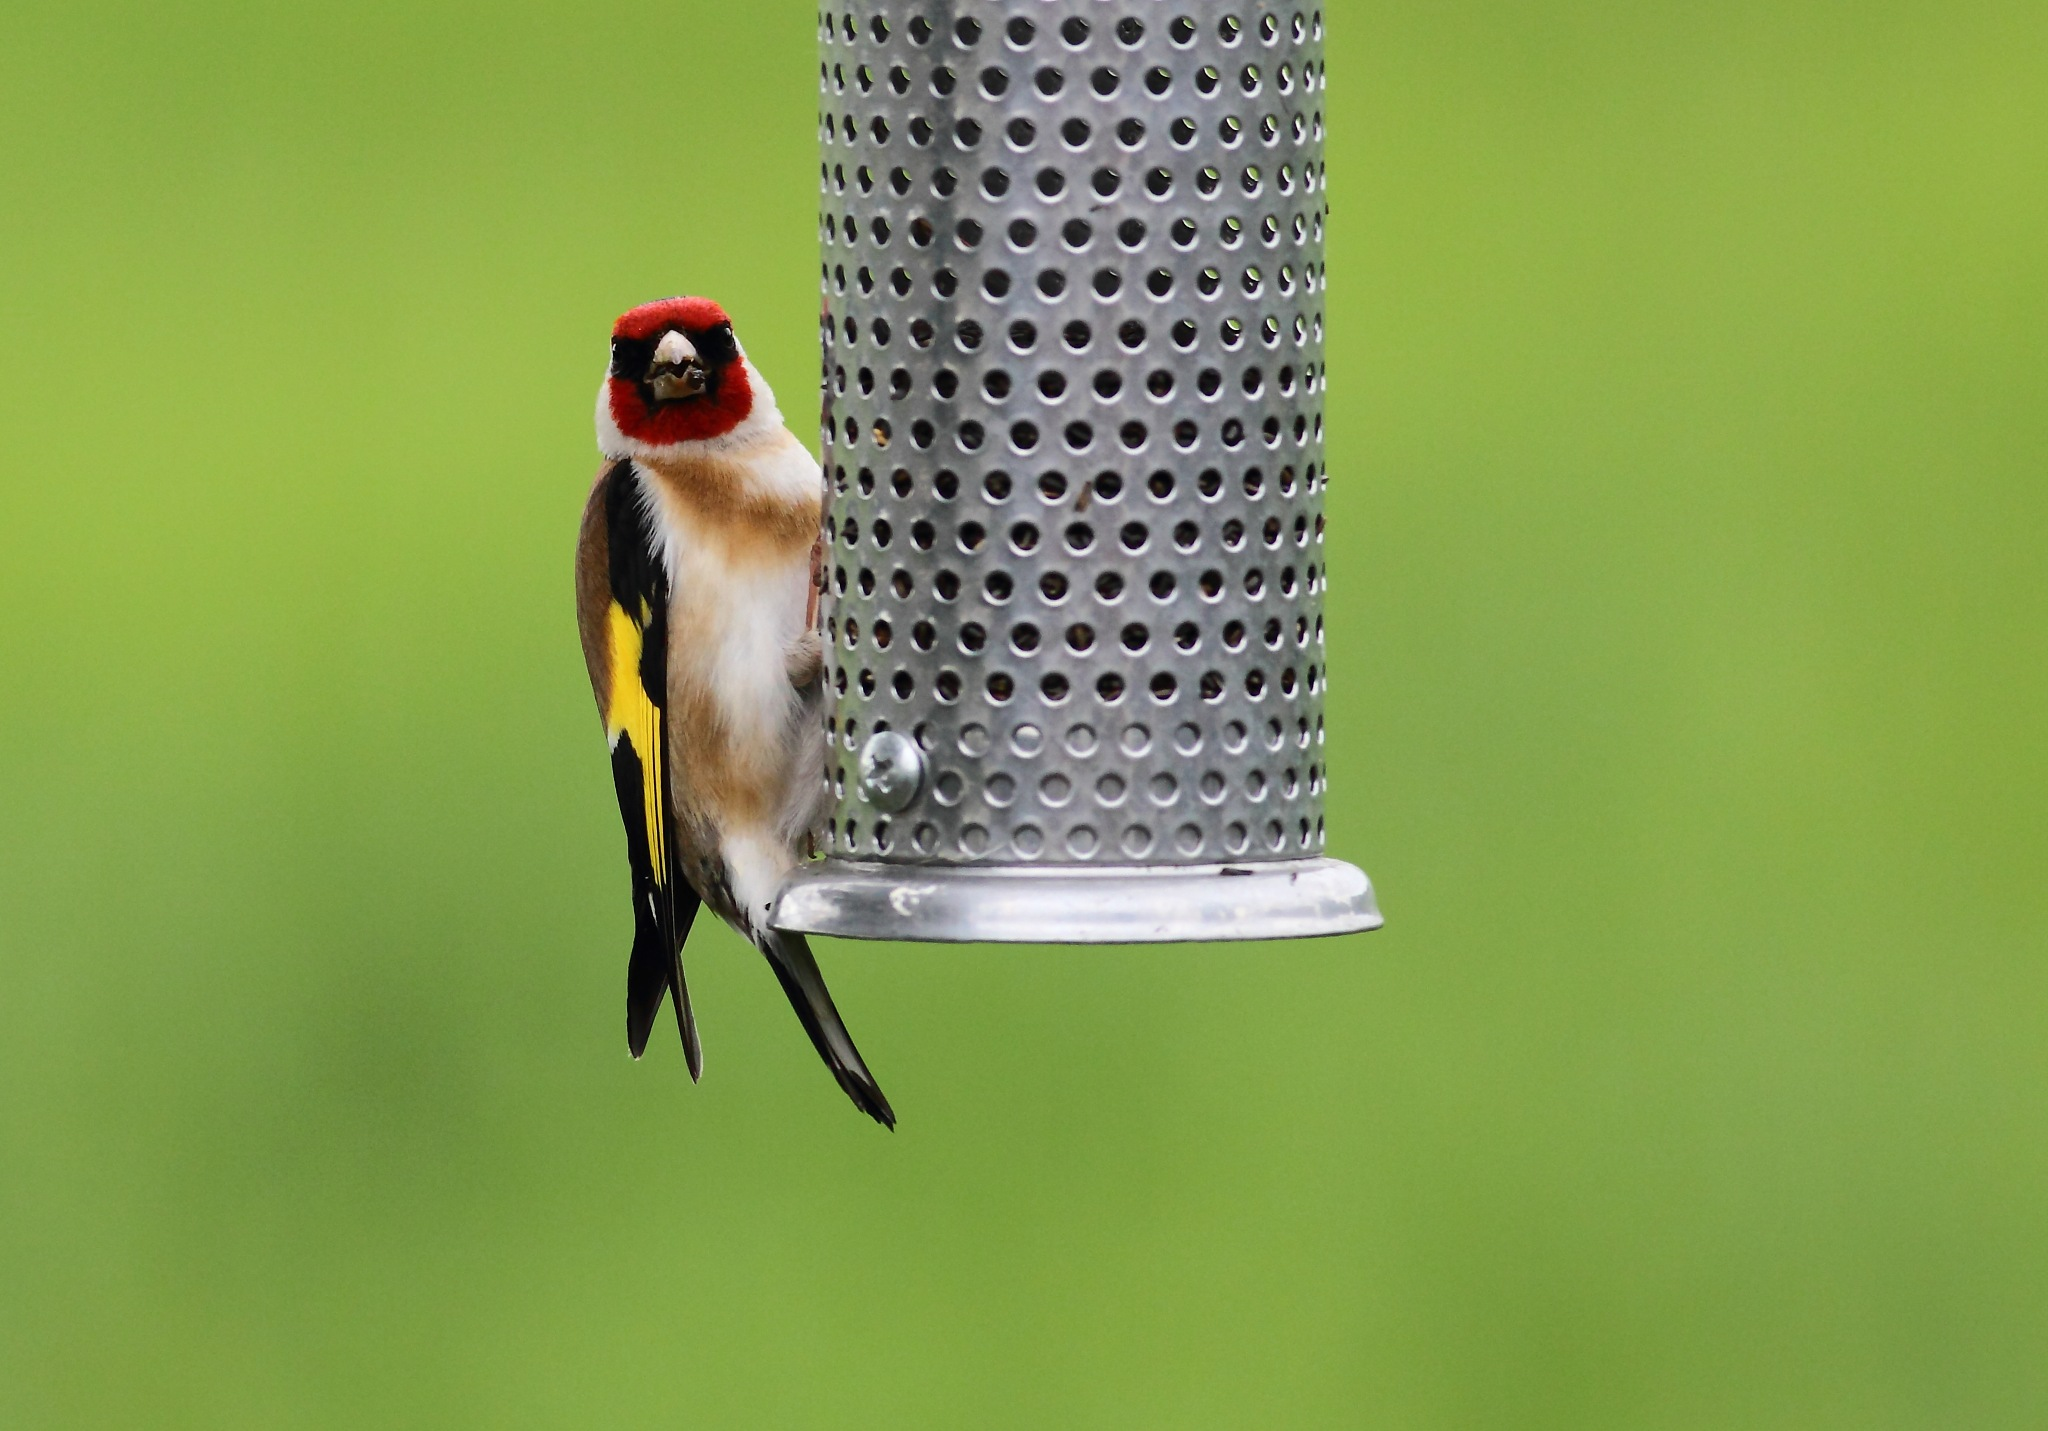 Goldfinch on feeder by Philip Watson